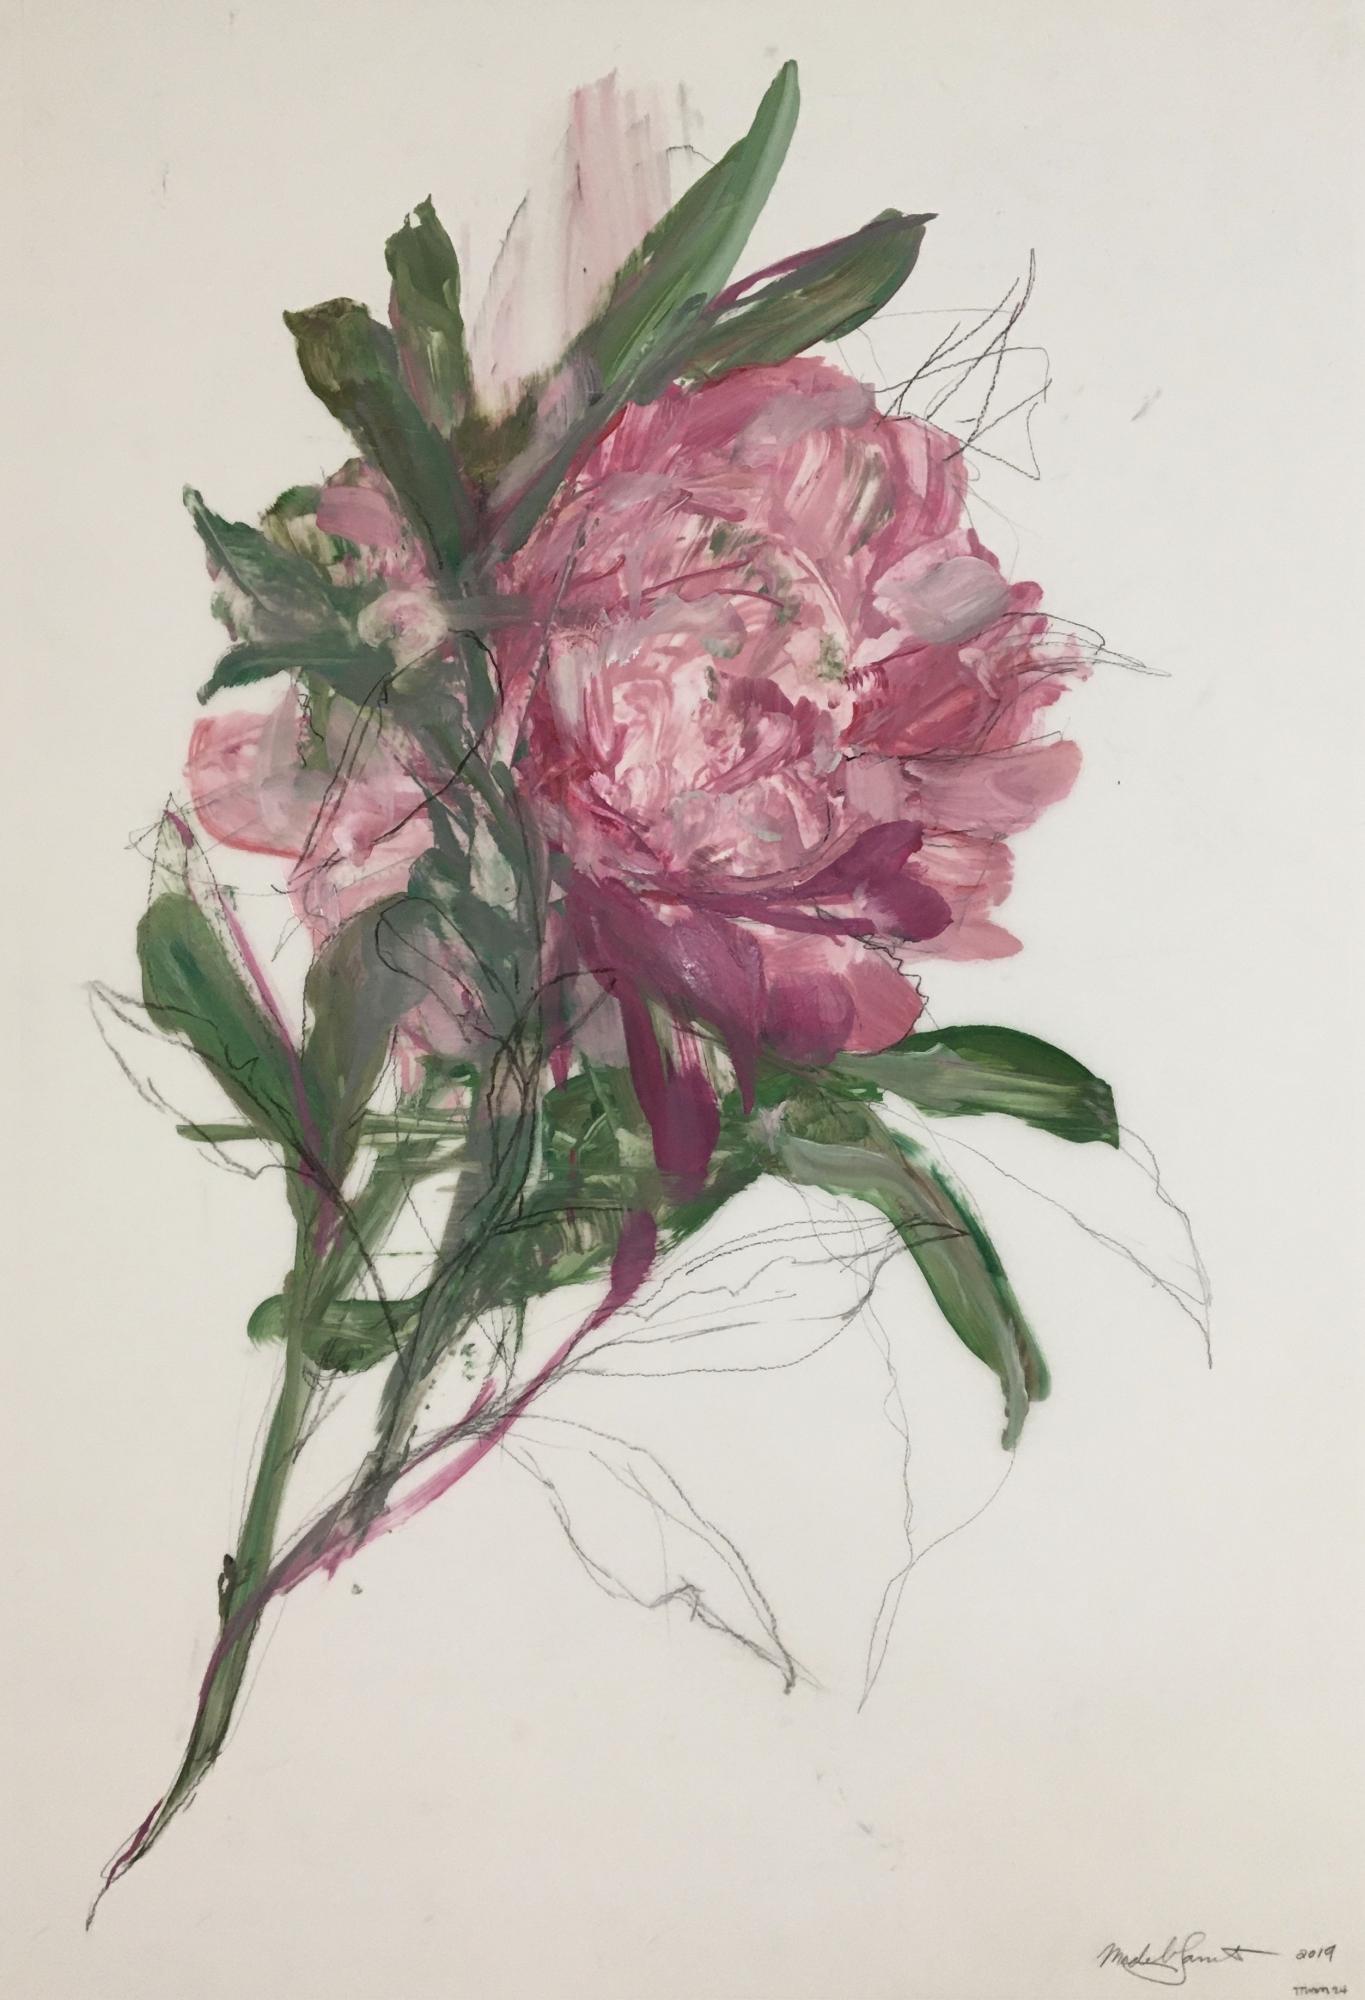 Pink Ladies 2020 - 2 by Madeleine Lamont